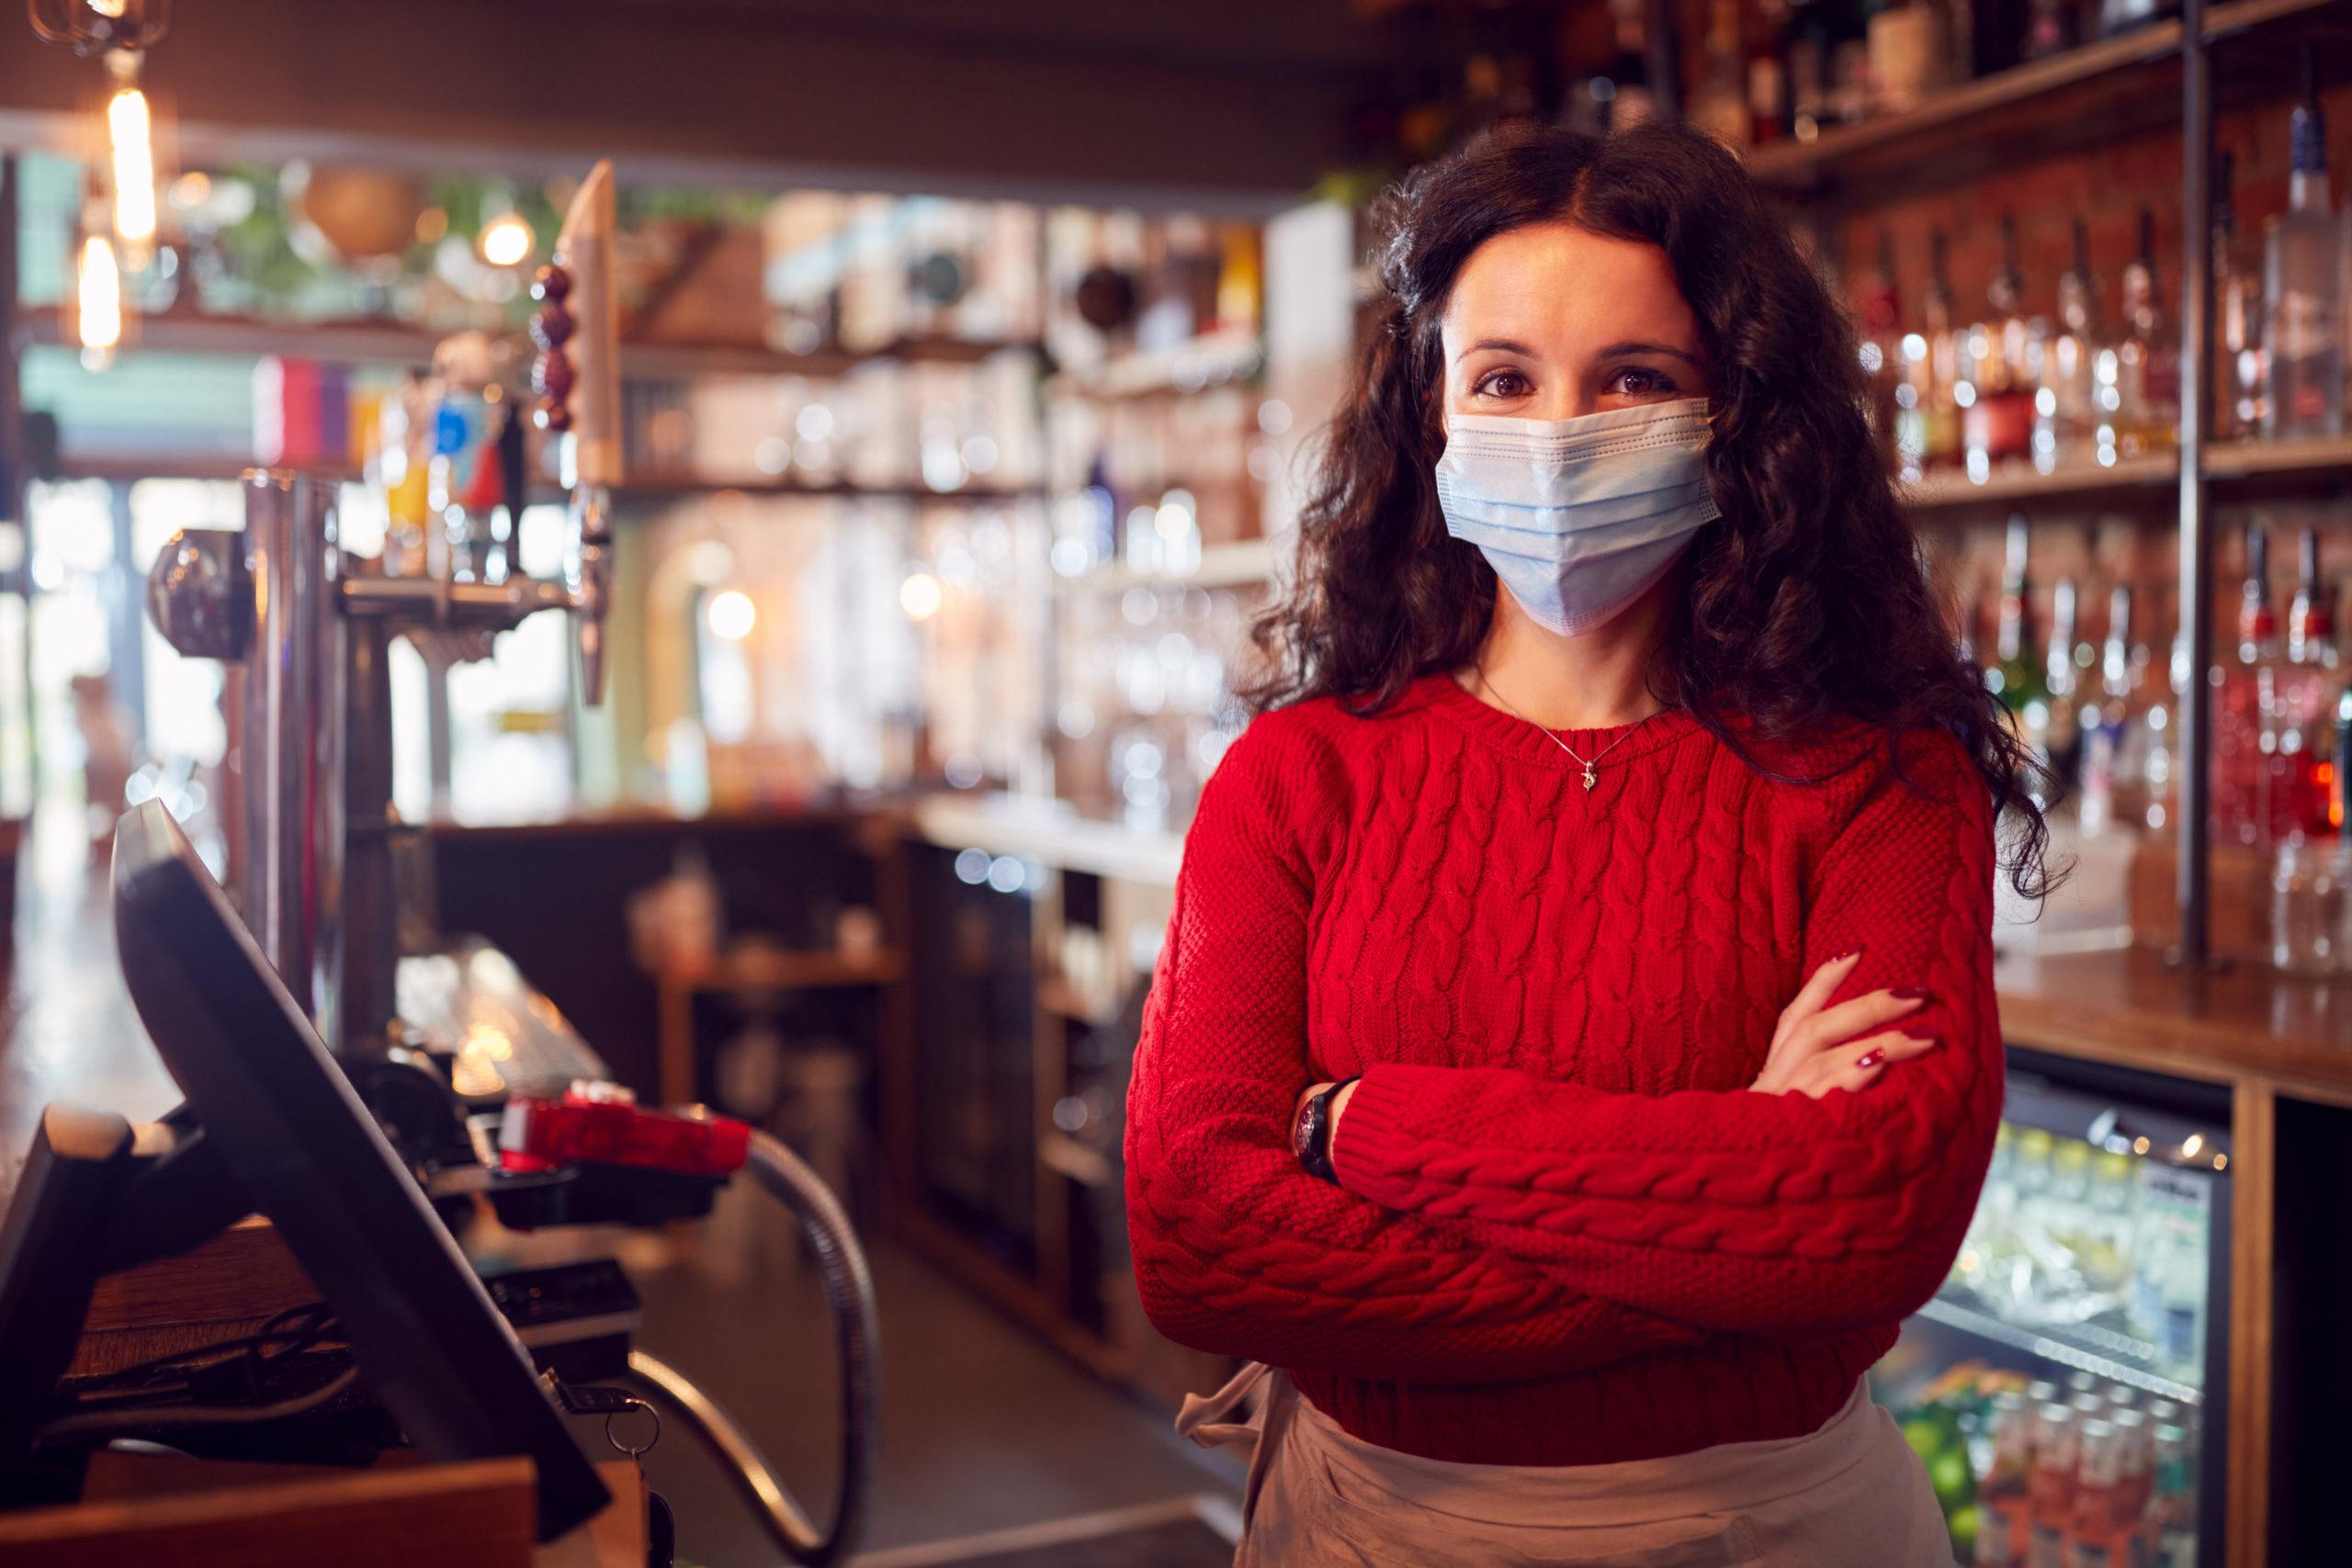 408 COVID-19 Pandemic Event Visa